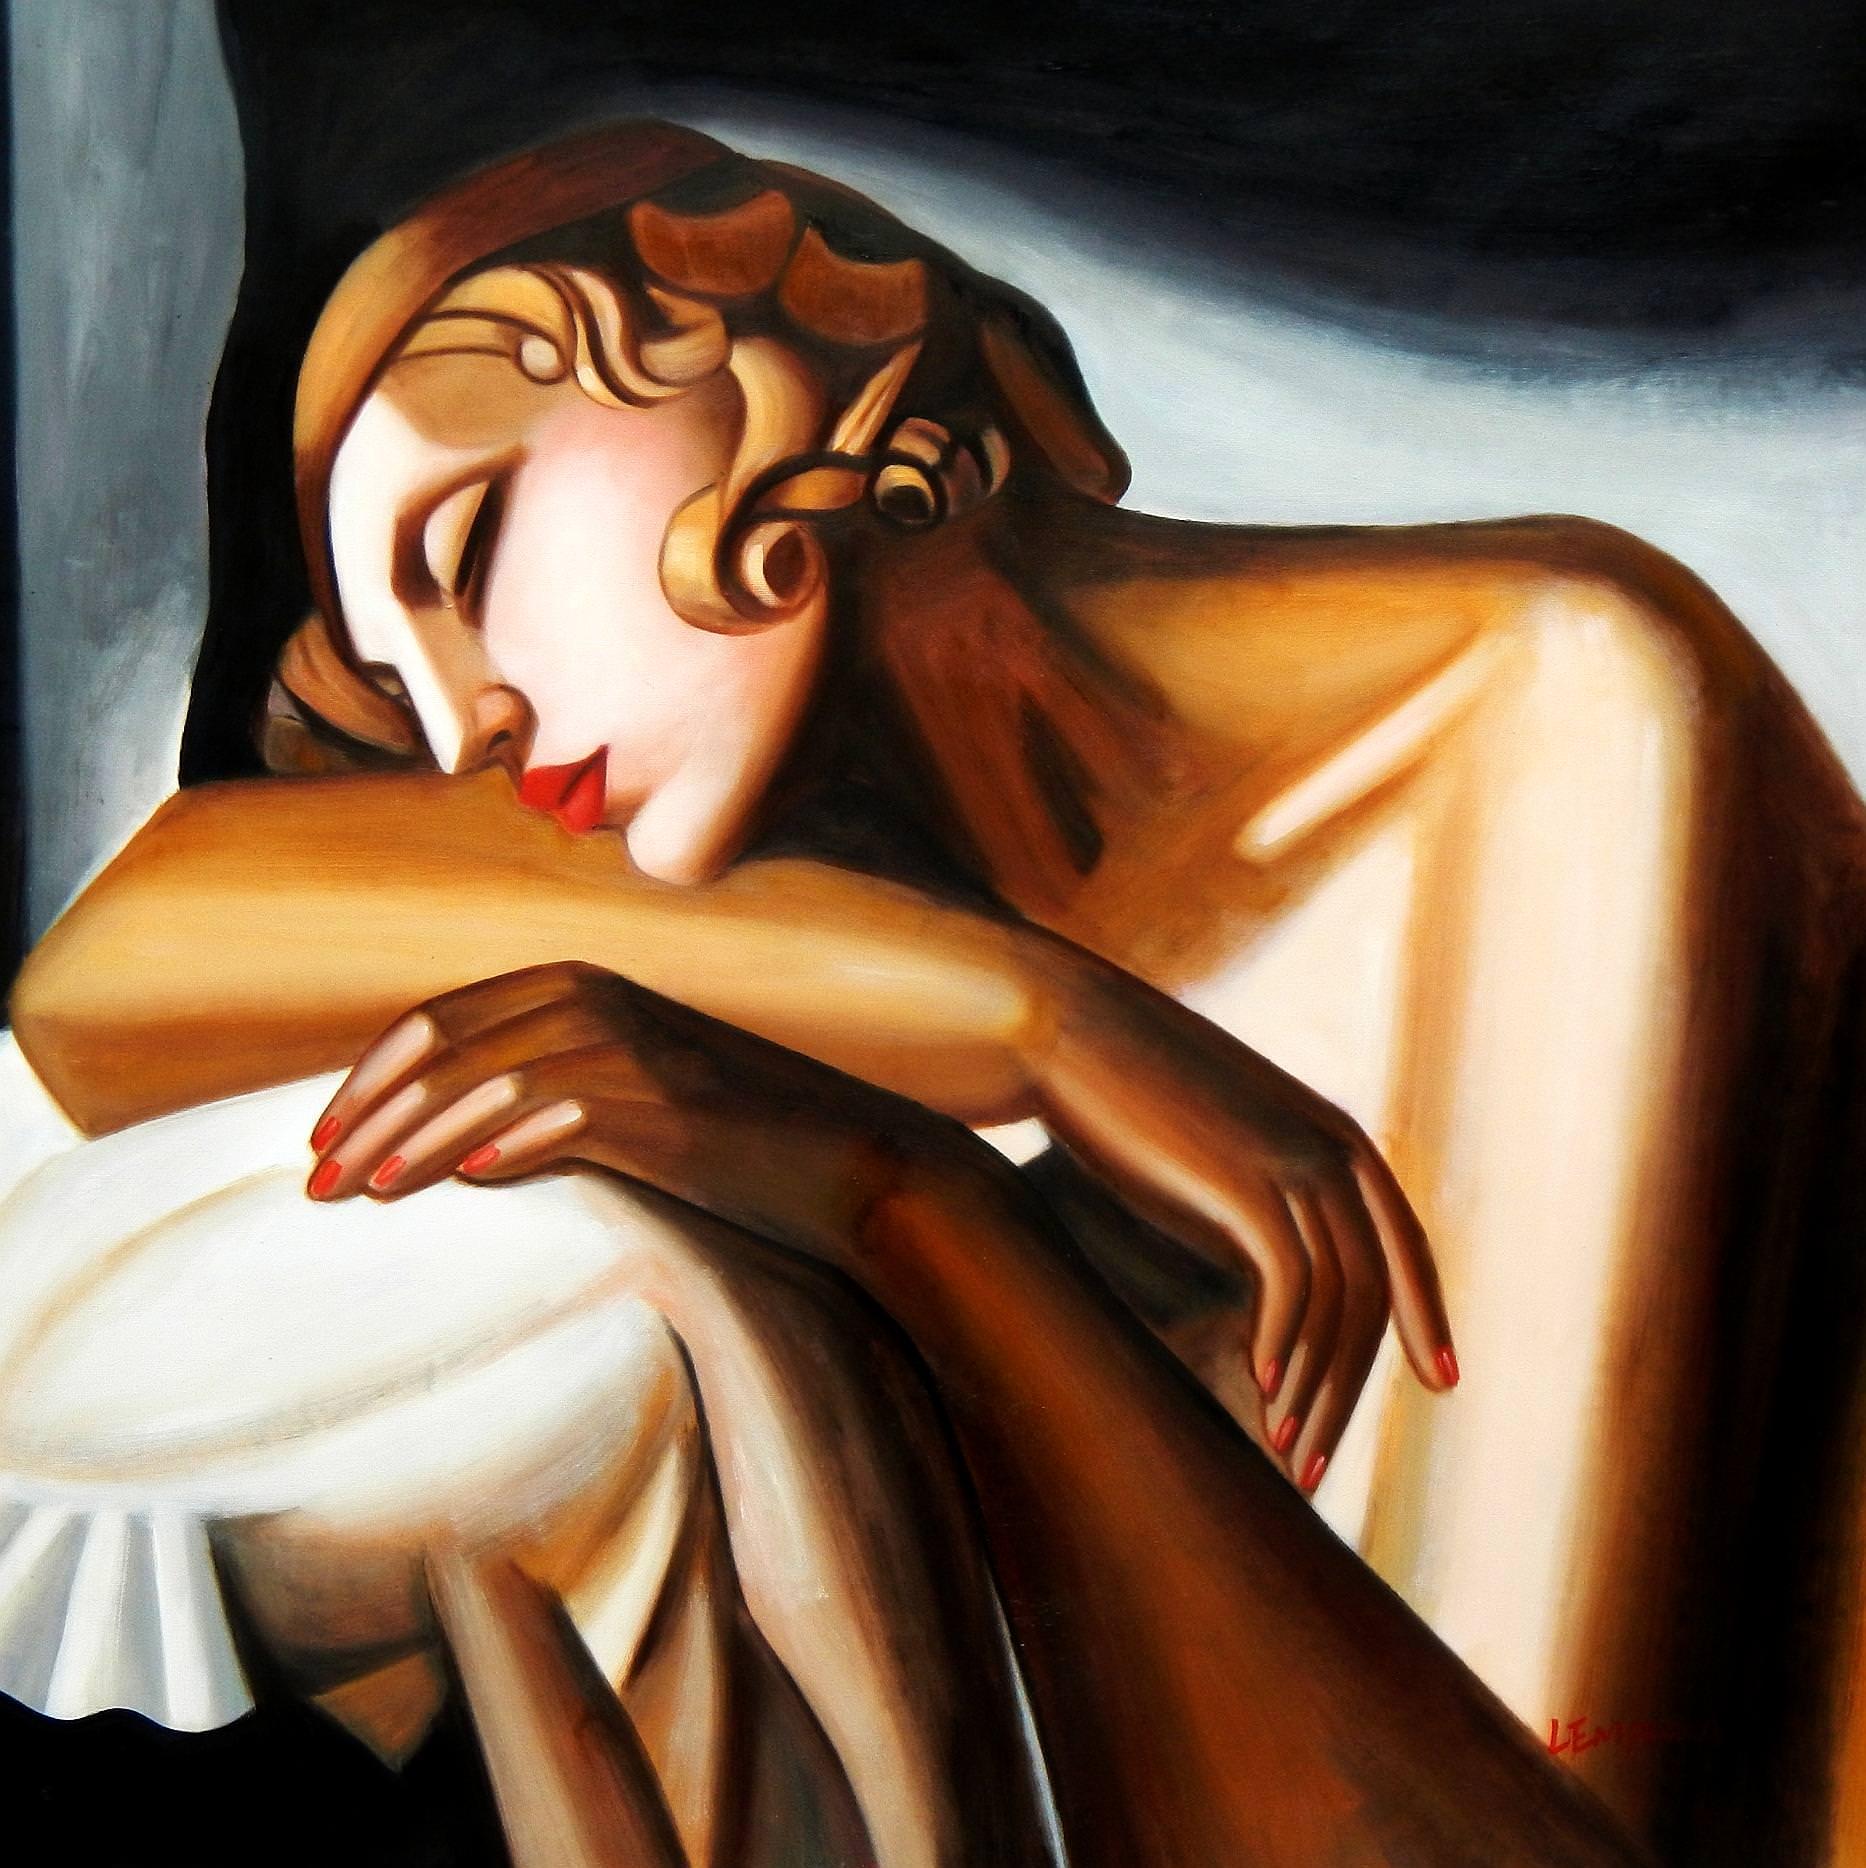 Homage of Tamara de Lempicka - Die Schläferin II g92940 80x80cm Art Deco Ölbild handgemalt